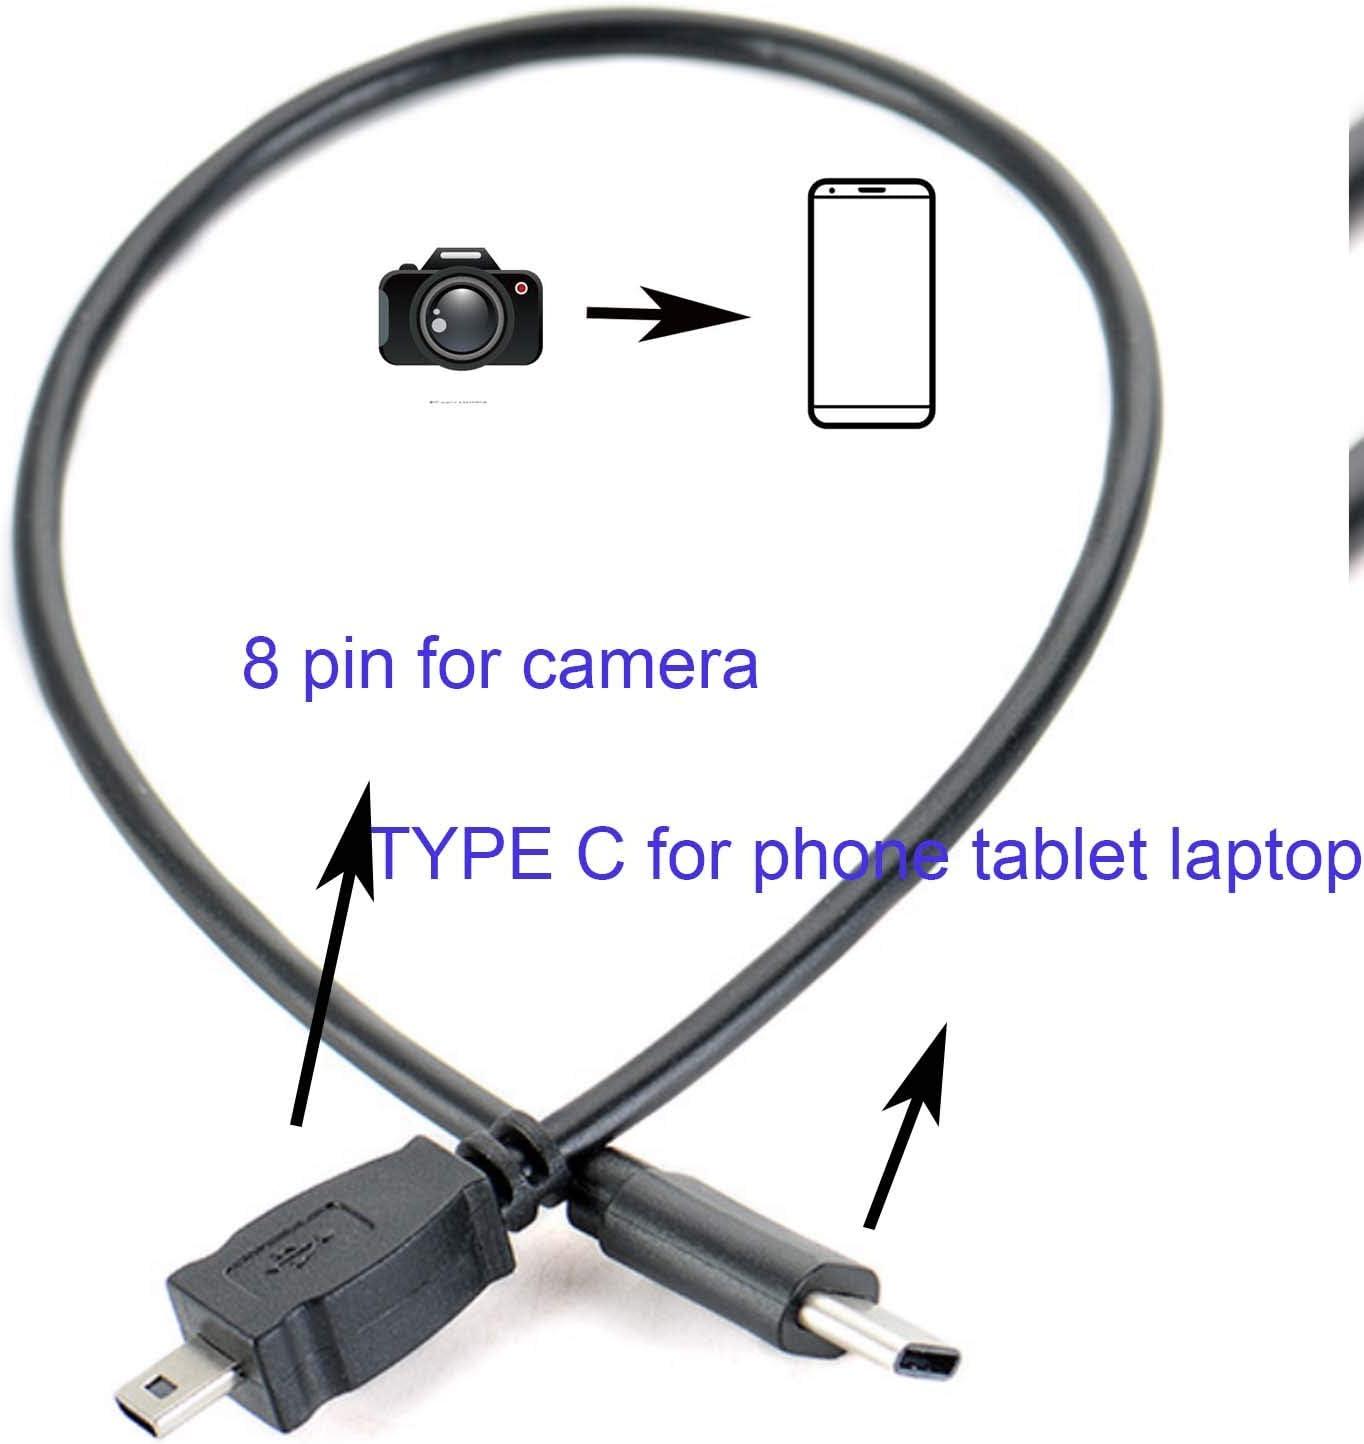 Microfiber Cleaning Cloth for LCD Screen Tablet Phone Computer Laptop Glasses Lens Eyeglasses UC-E16 UC-E17 Camera Compatible//Nikon Coolpix S6000 S6150 S6200 S6100 6 feet USB 2.0 Nikon UC-E6